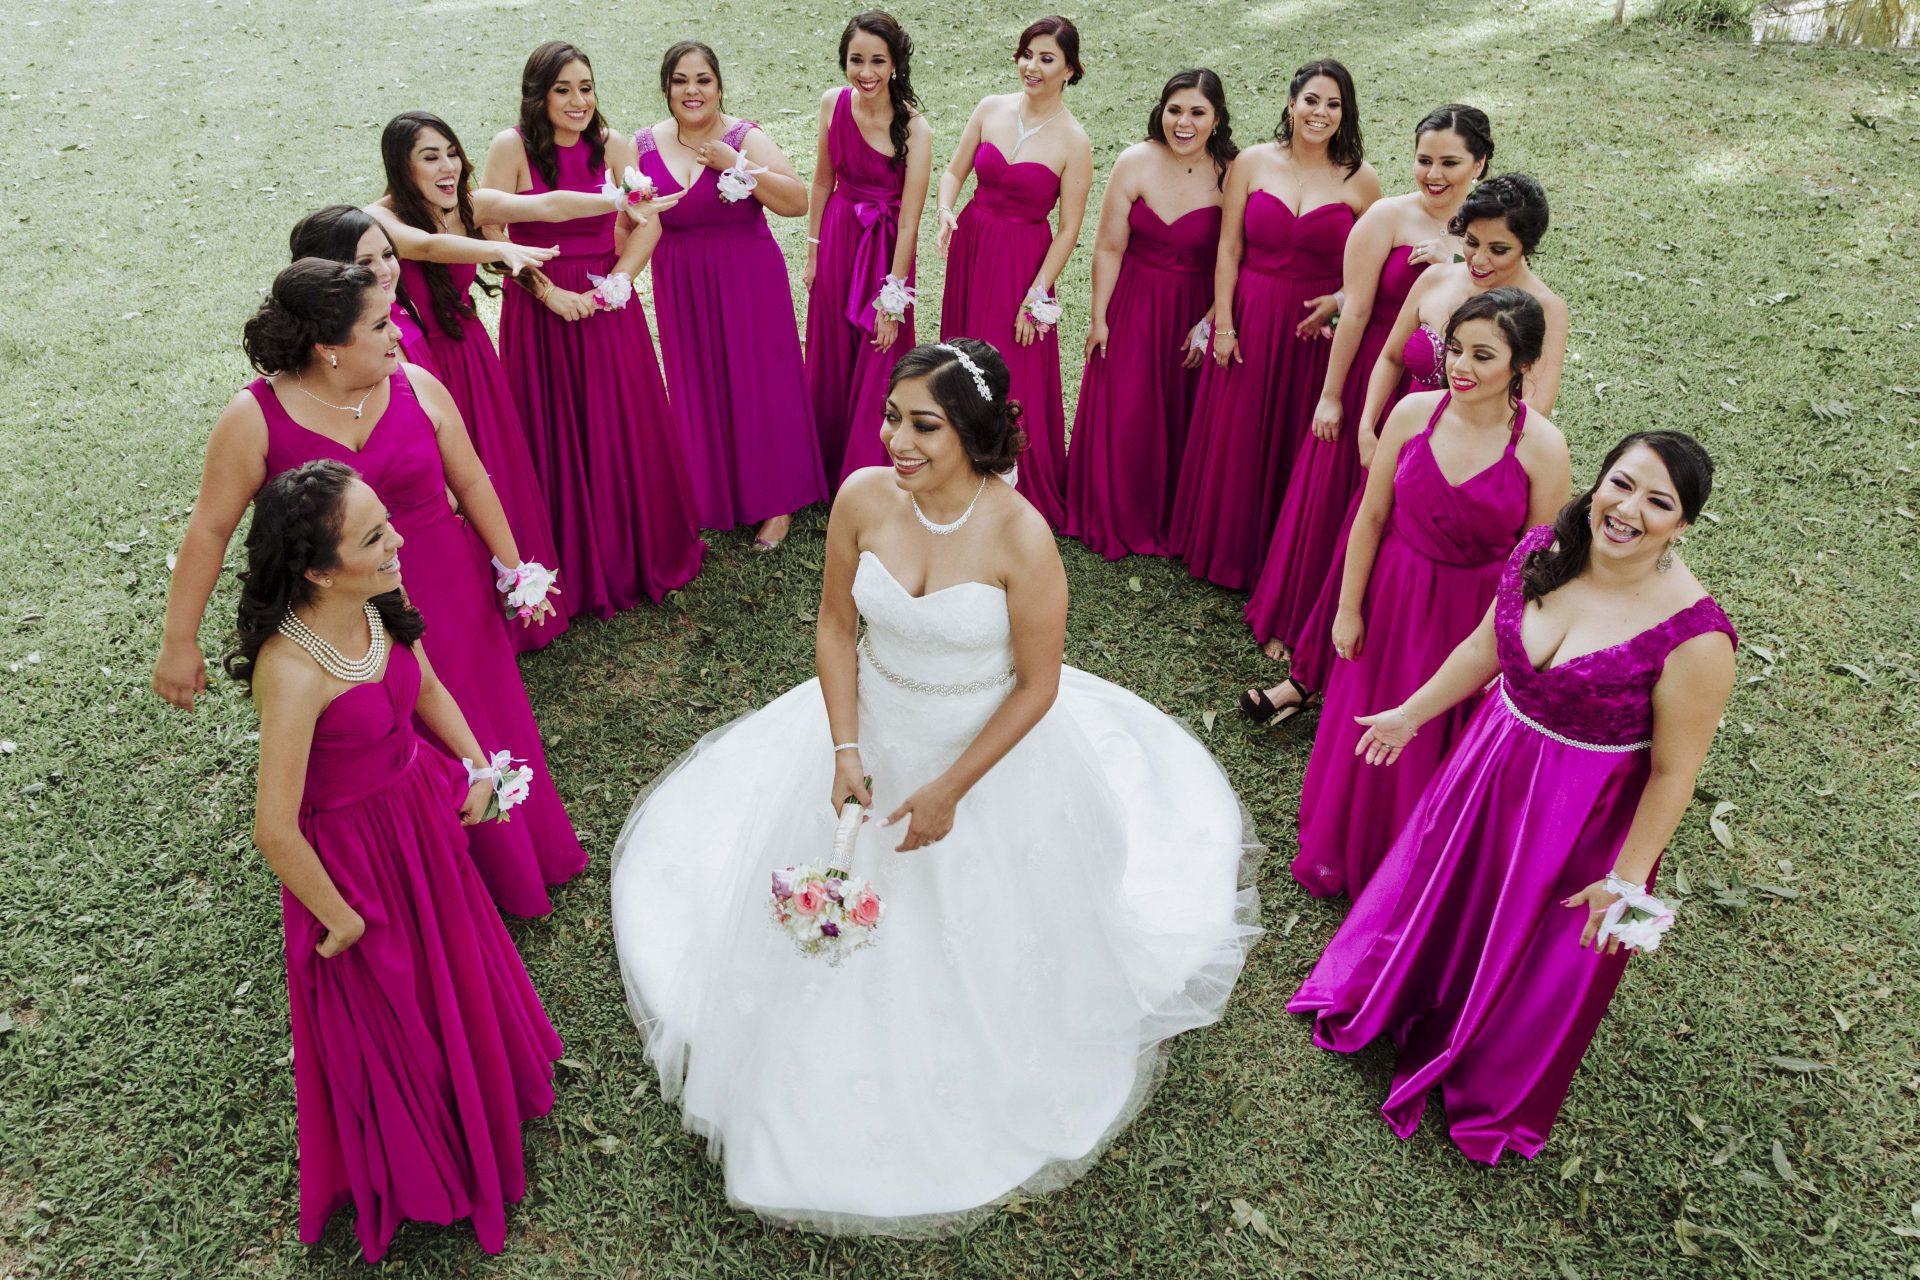 fotografo_profesional_zacatecas_chihuahua_bodas_xv_mexico-36